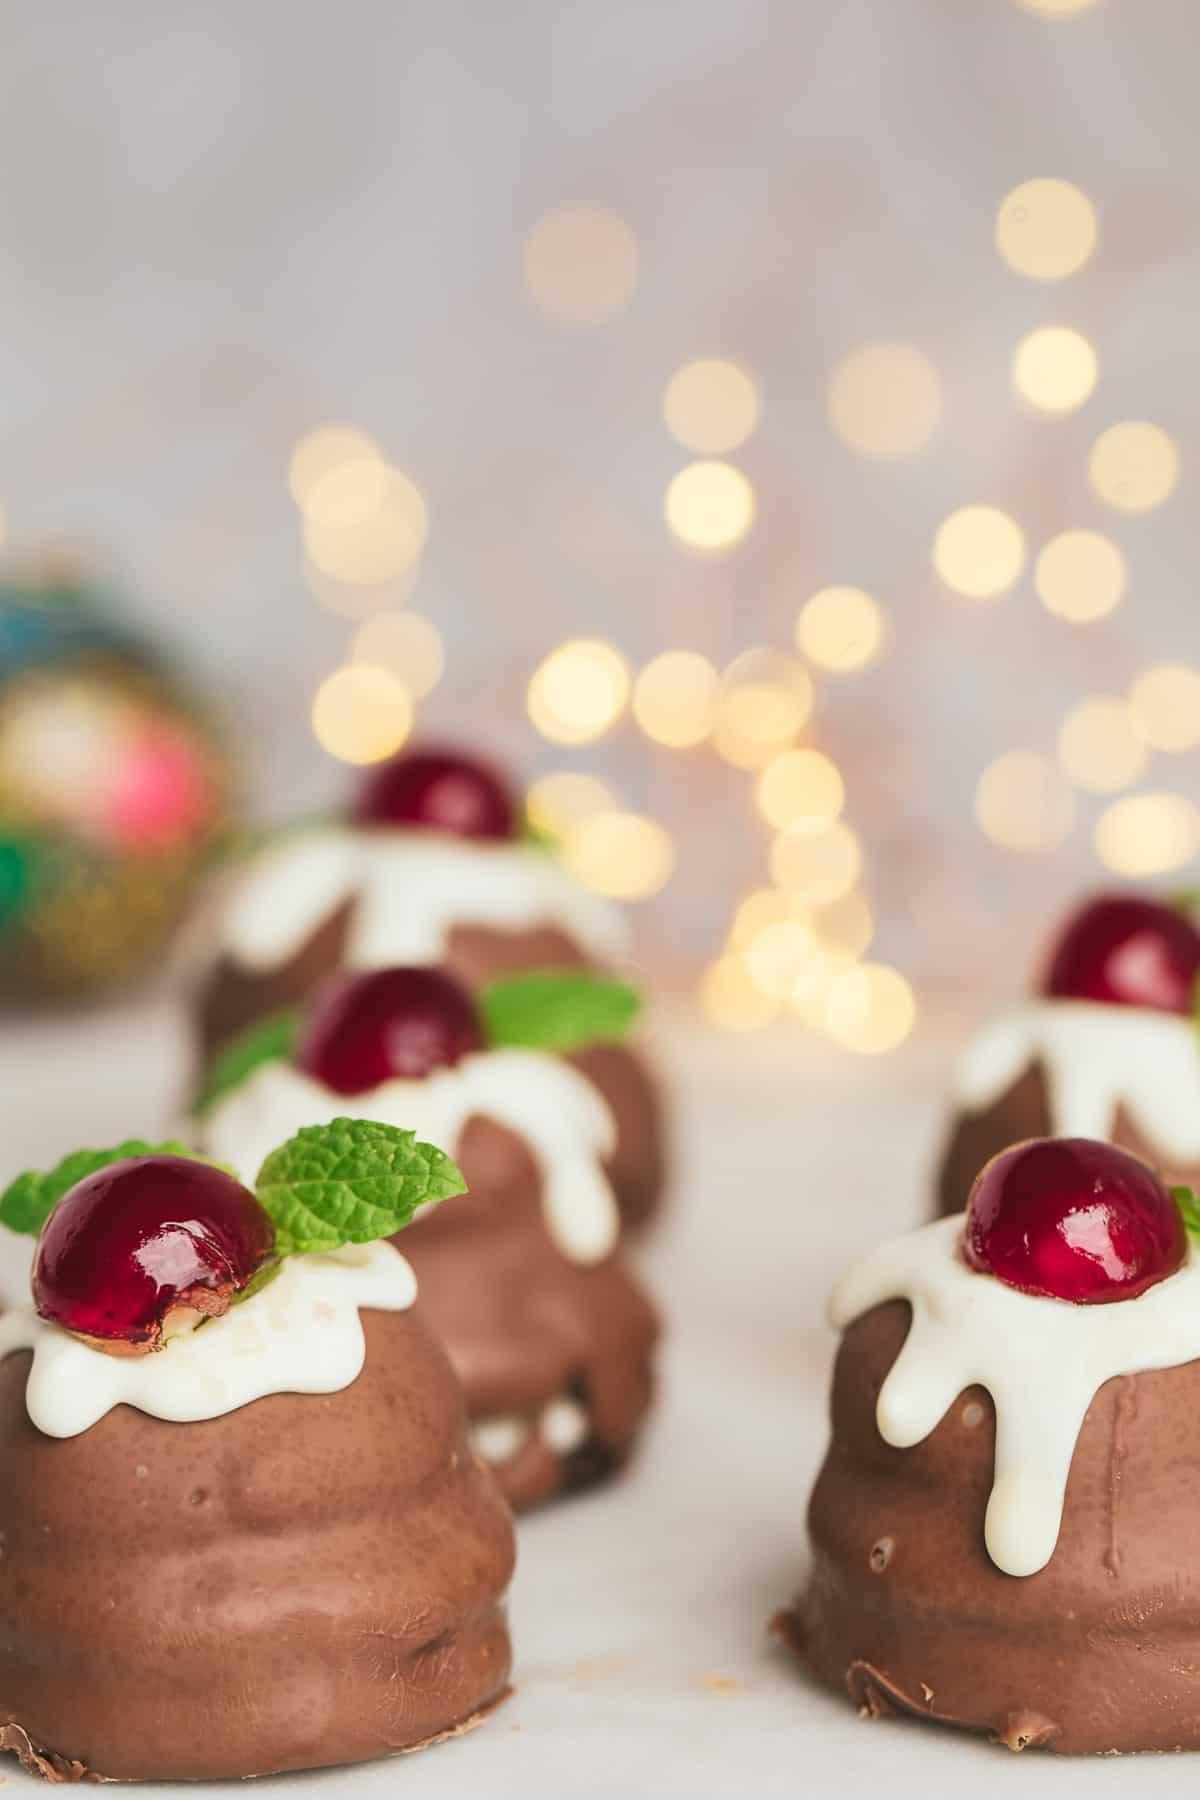 Small chocolate Christmas desserts.